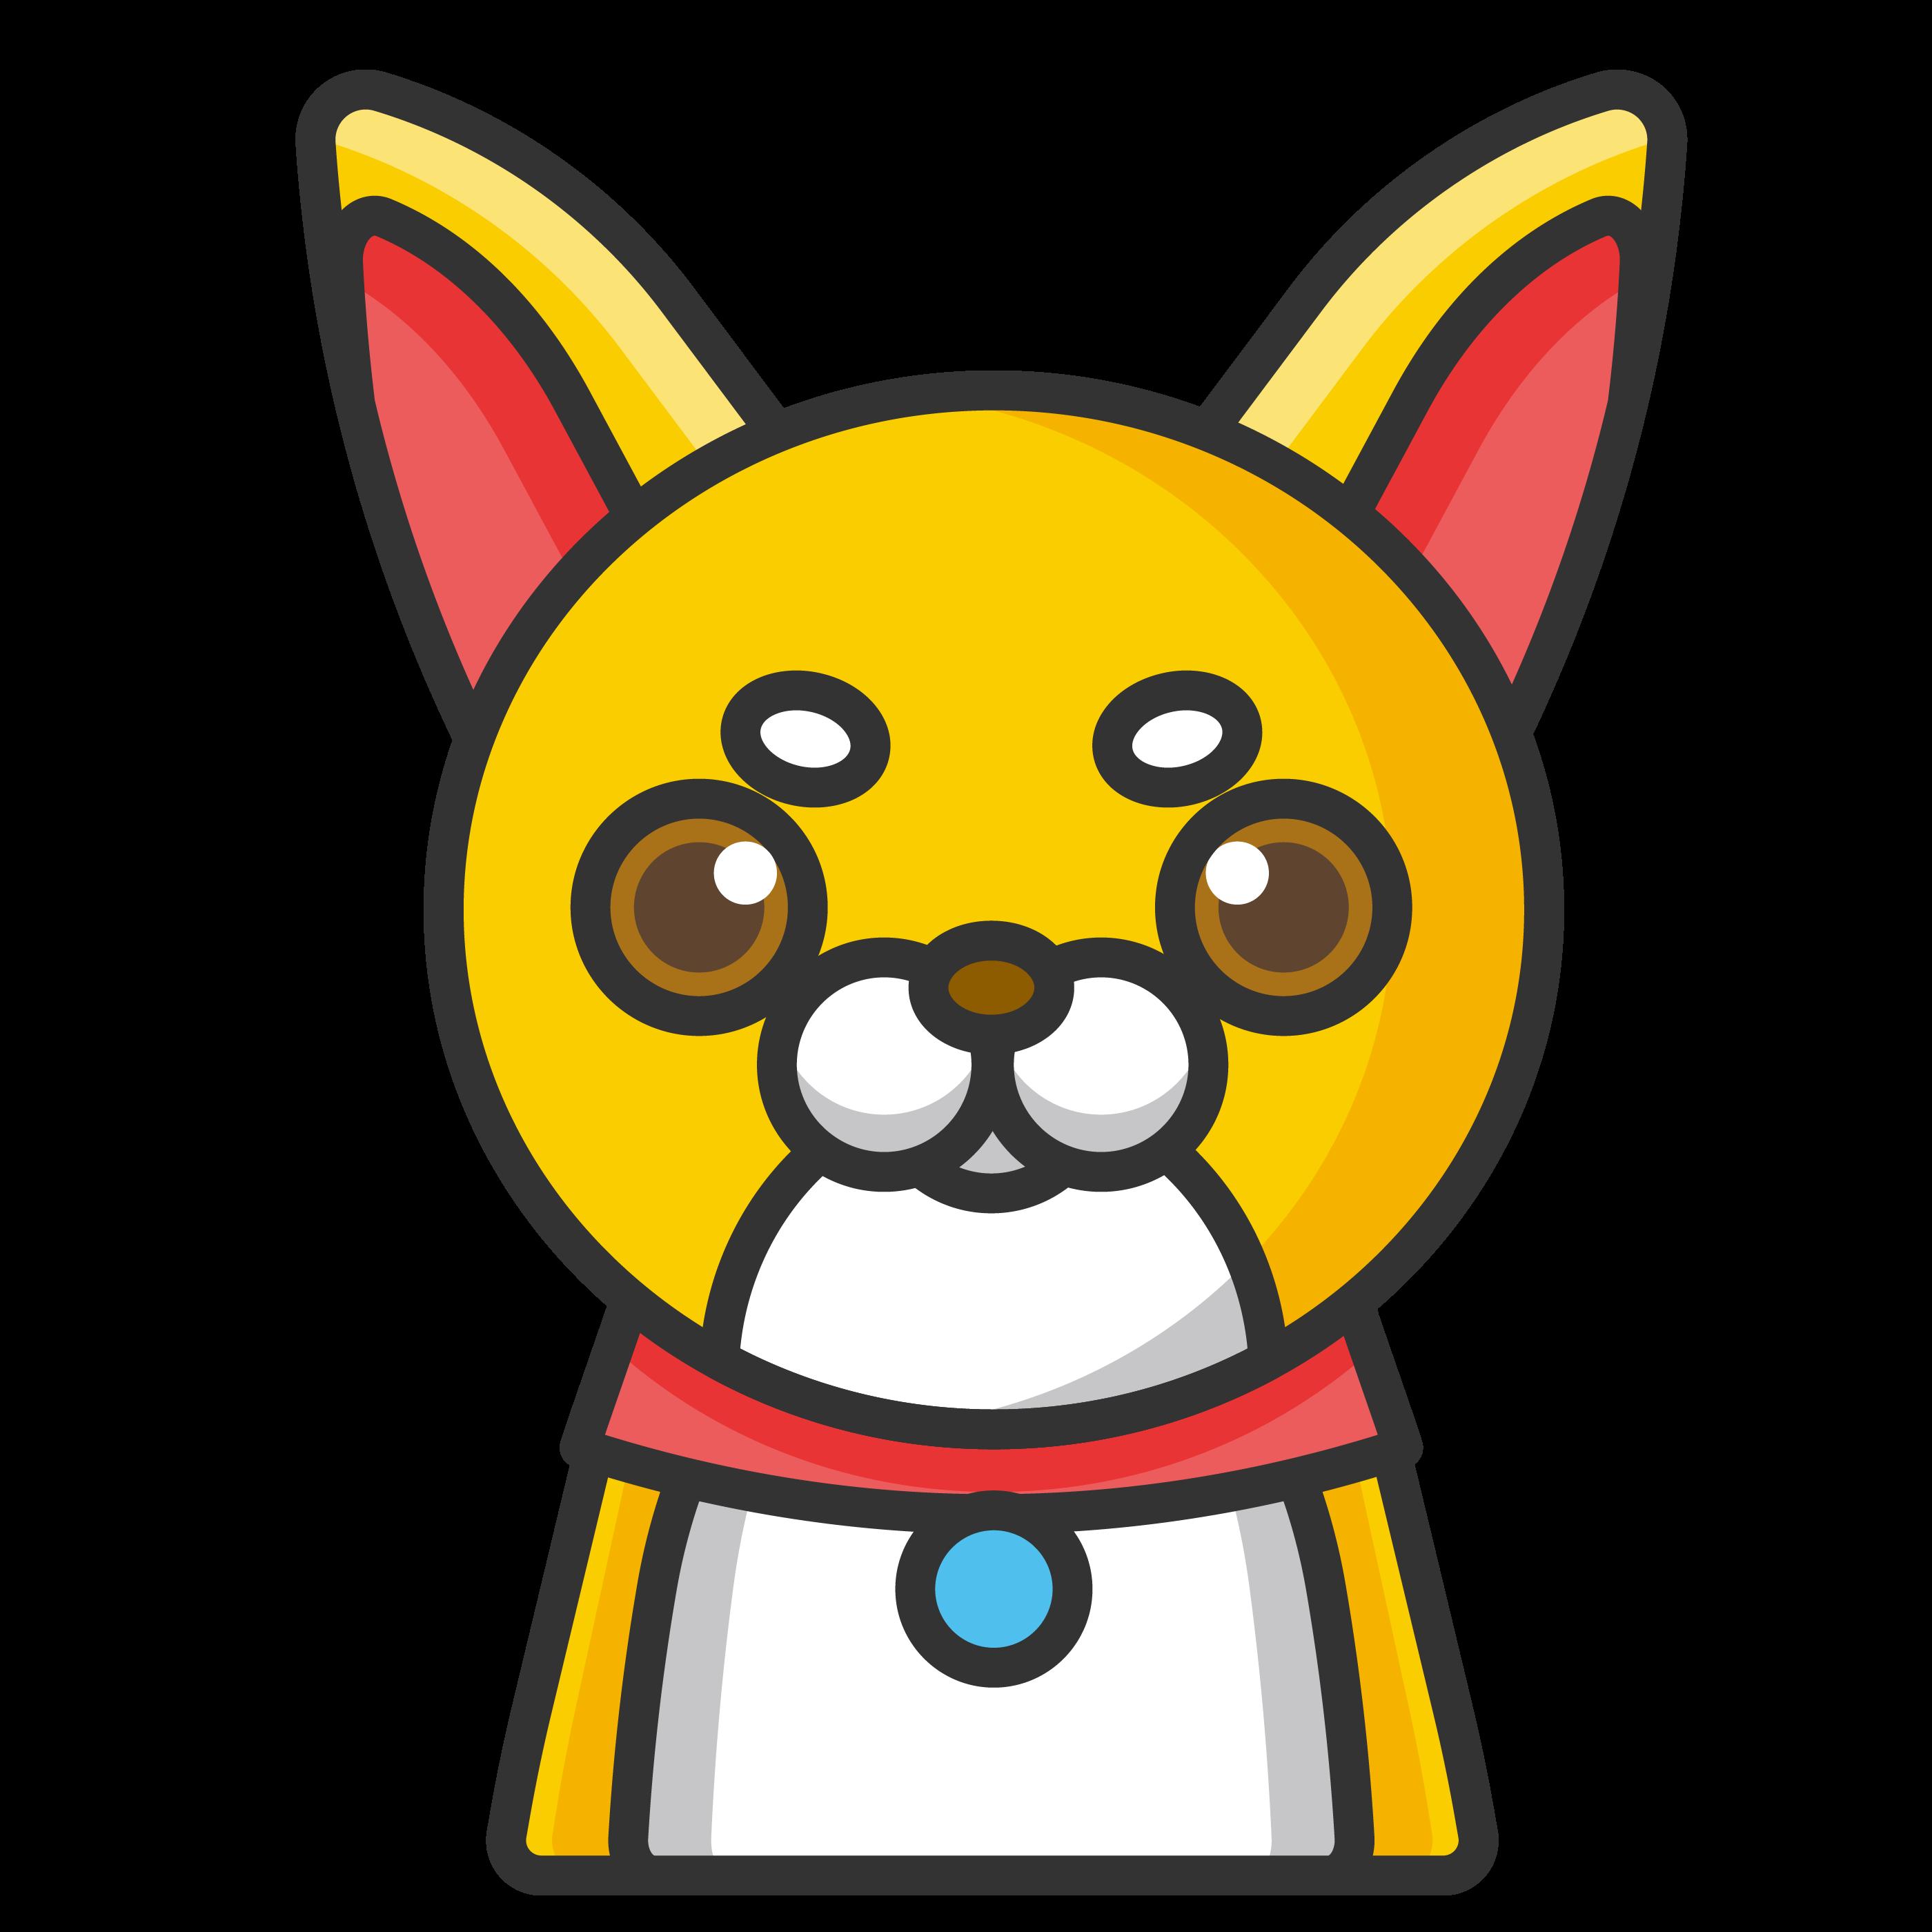 cats-roaming-icon